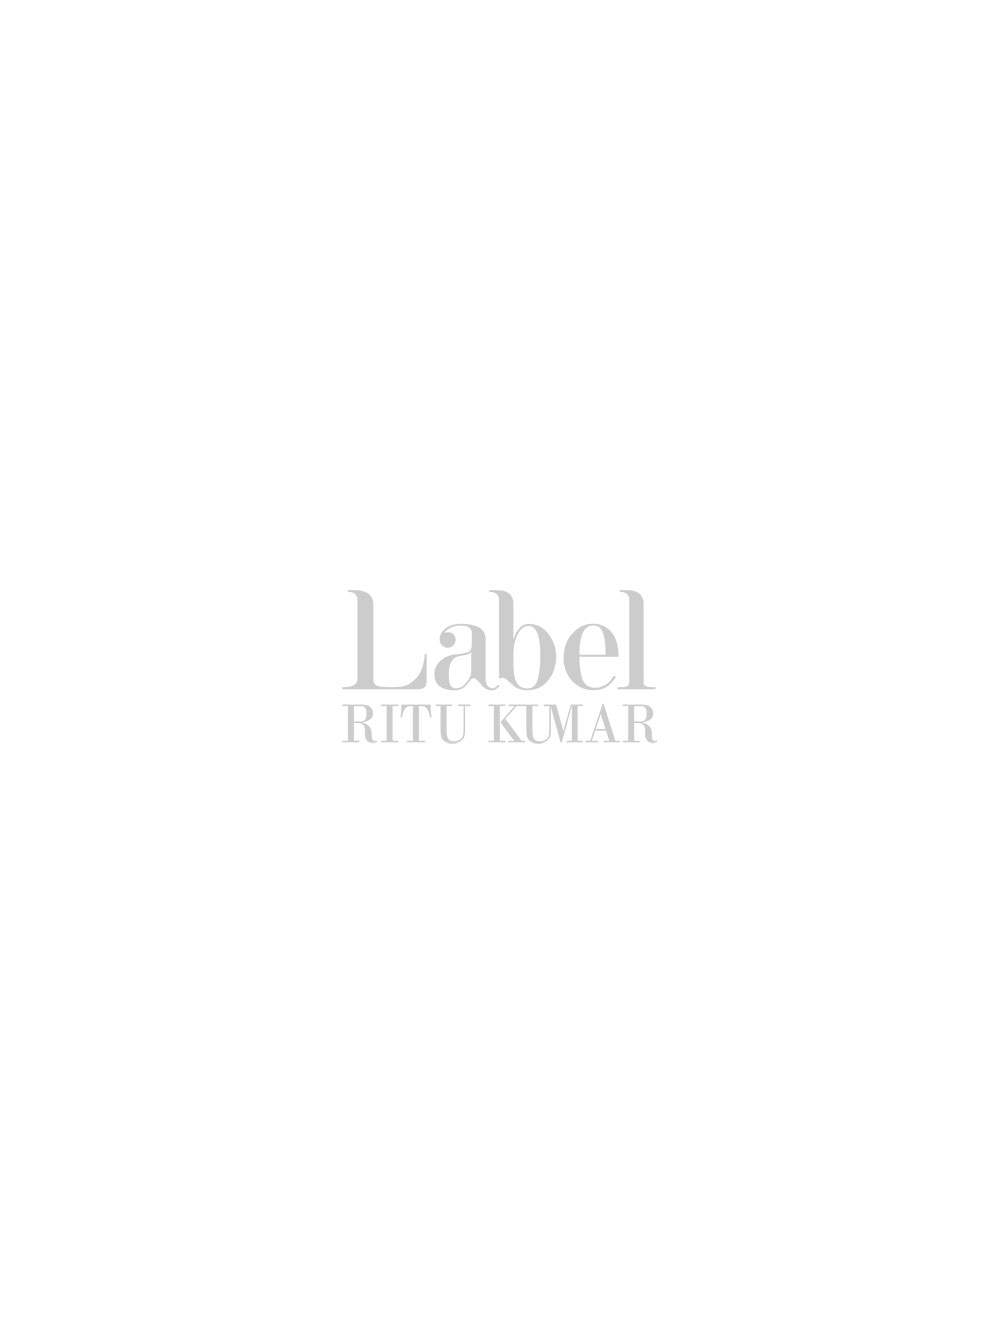 Peach Shirt with Signature Label Ritu Kumar Jodhpur Prints